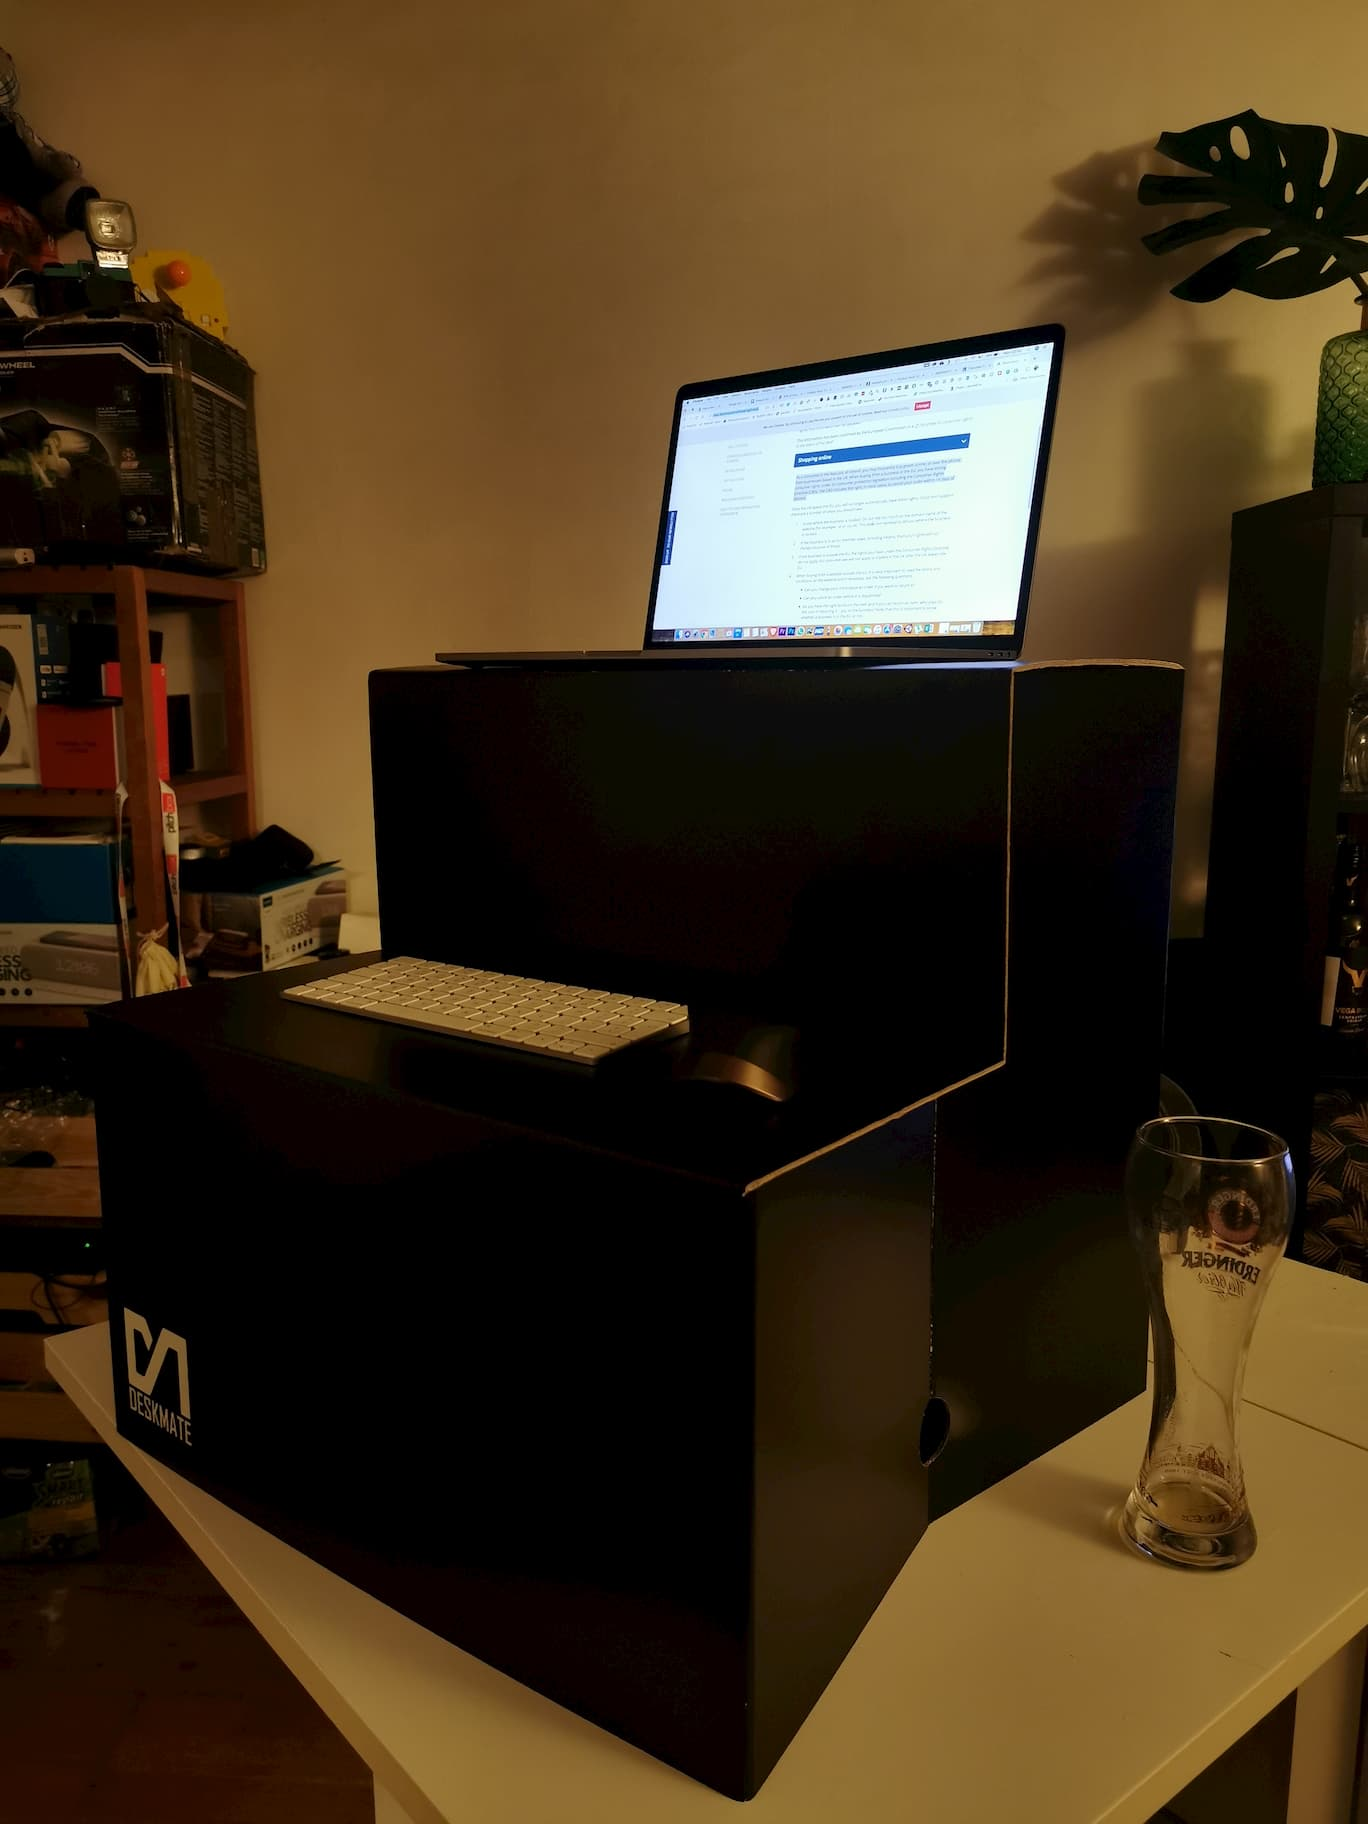 deskmate cheap standing desk alternative